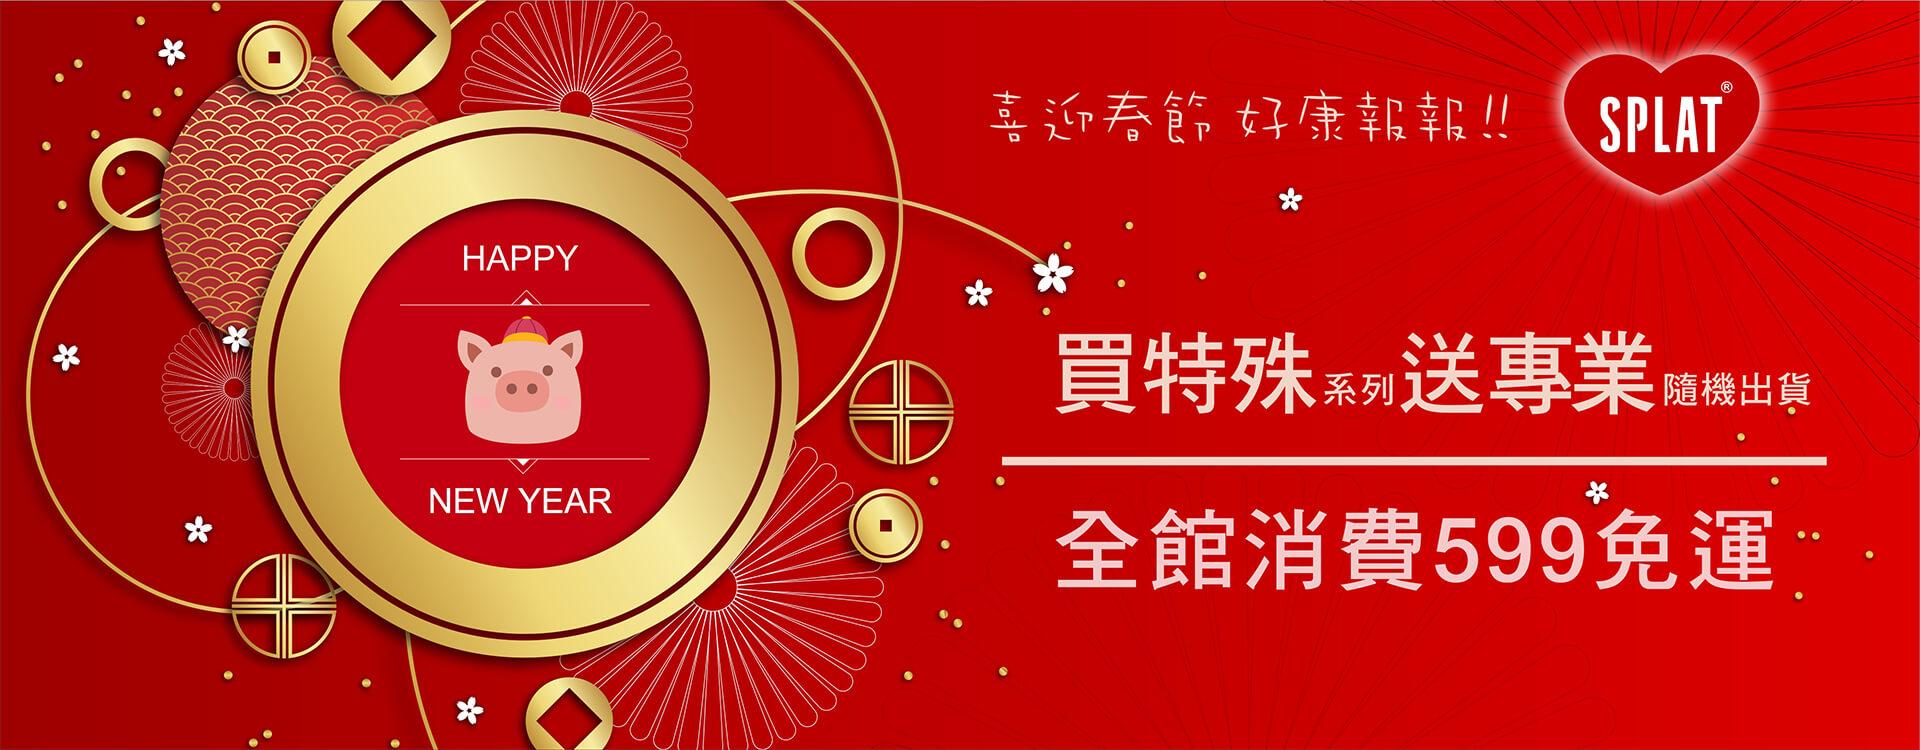 SPLAT舒潔特新春感謝祭